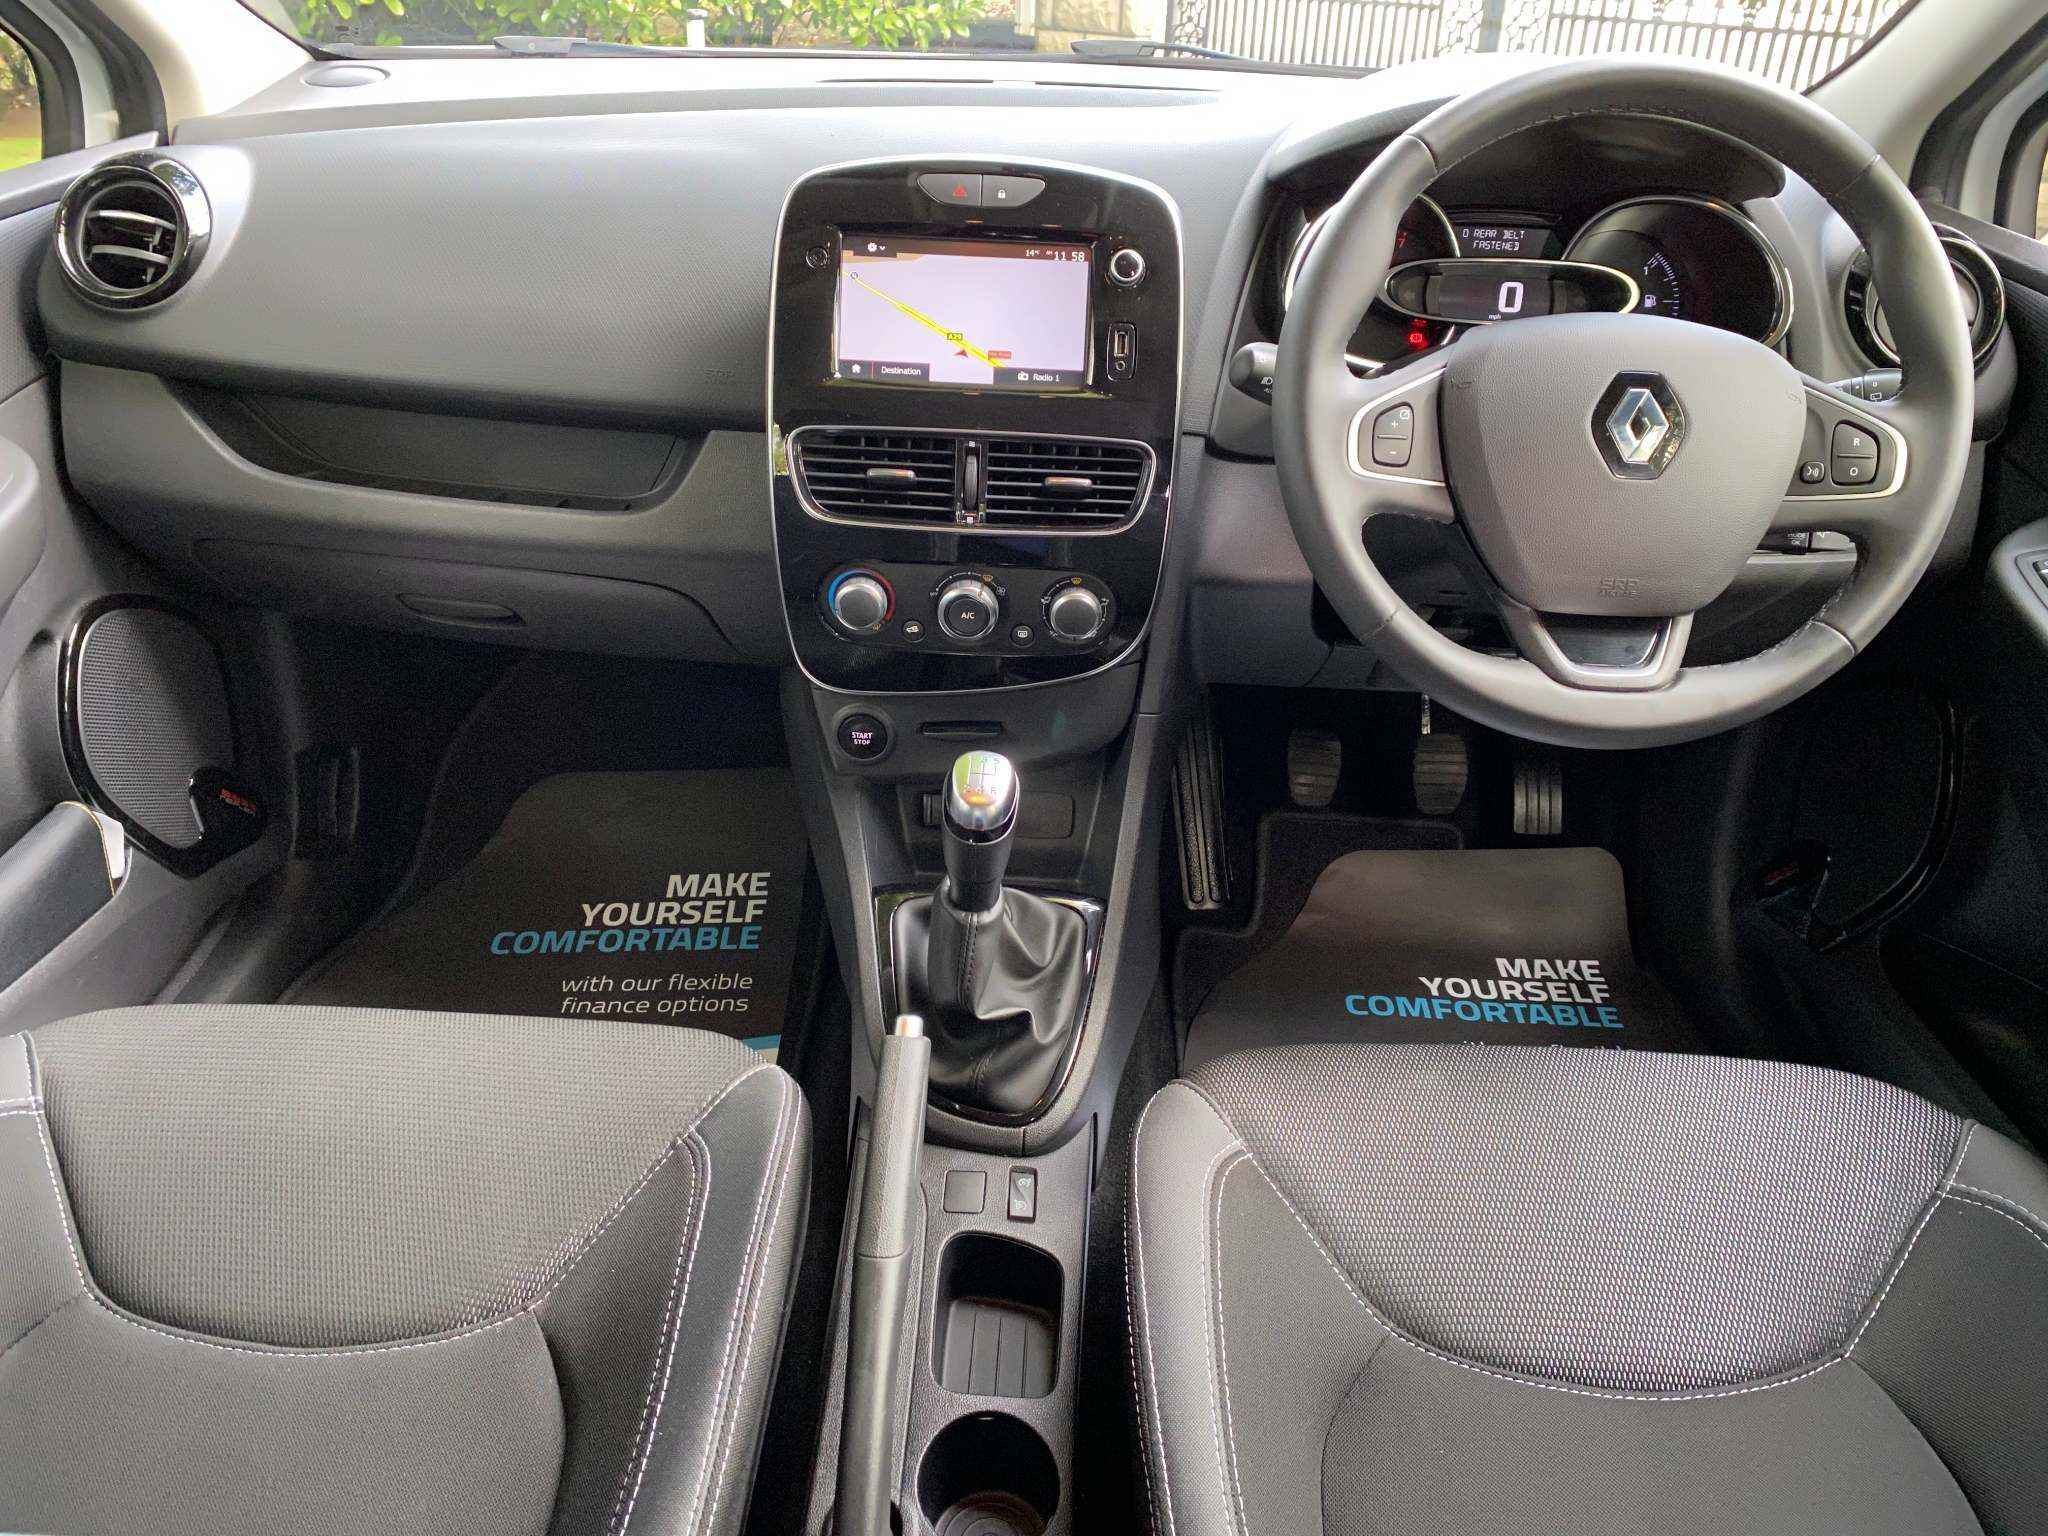 2017 Renault Clio 1.2 16V Dynamique Nav 5dr Petrol Manual – Moyway Motors Dungannon full